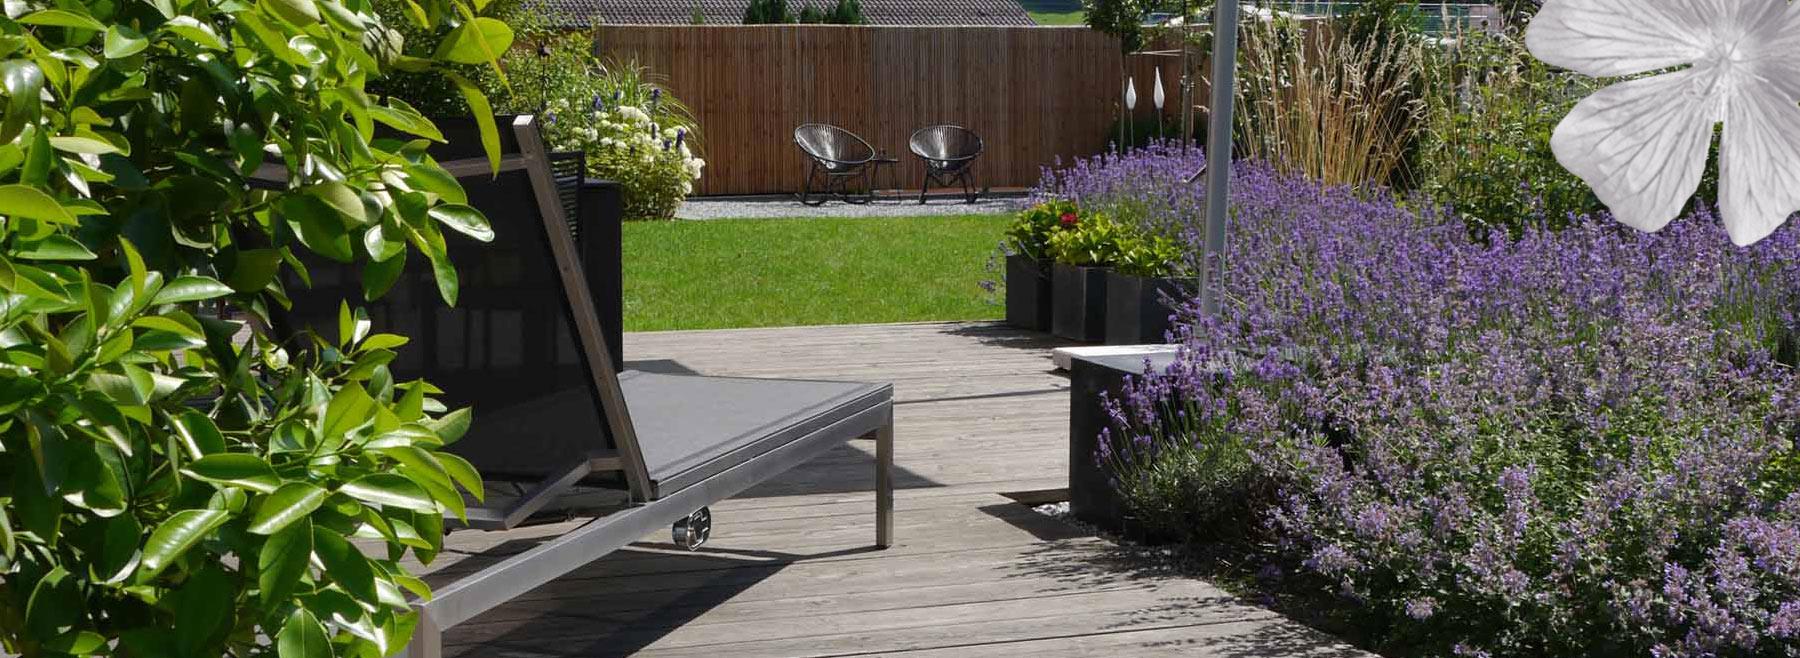 Impressum gartengestaltung paulus for Gartengestaltung app